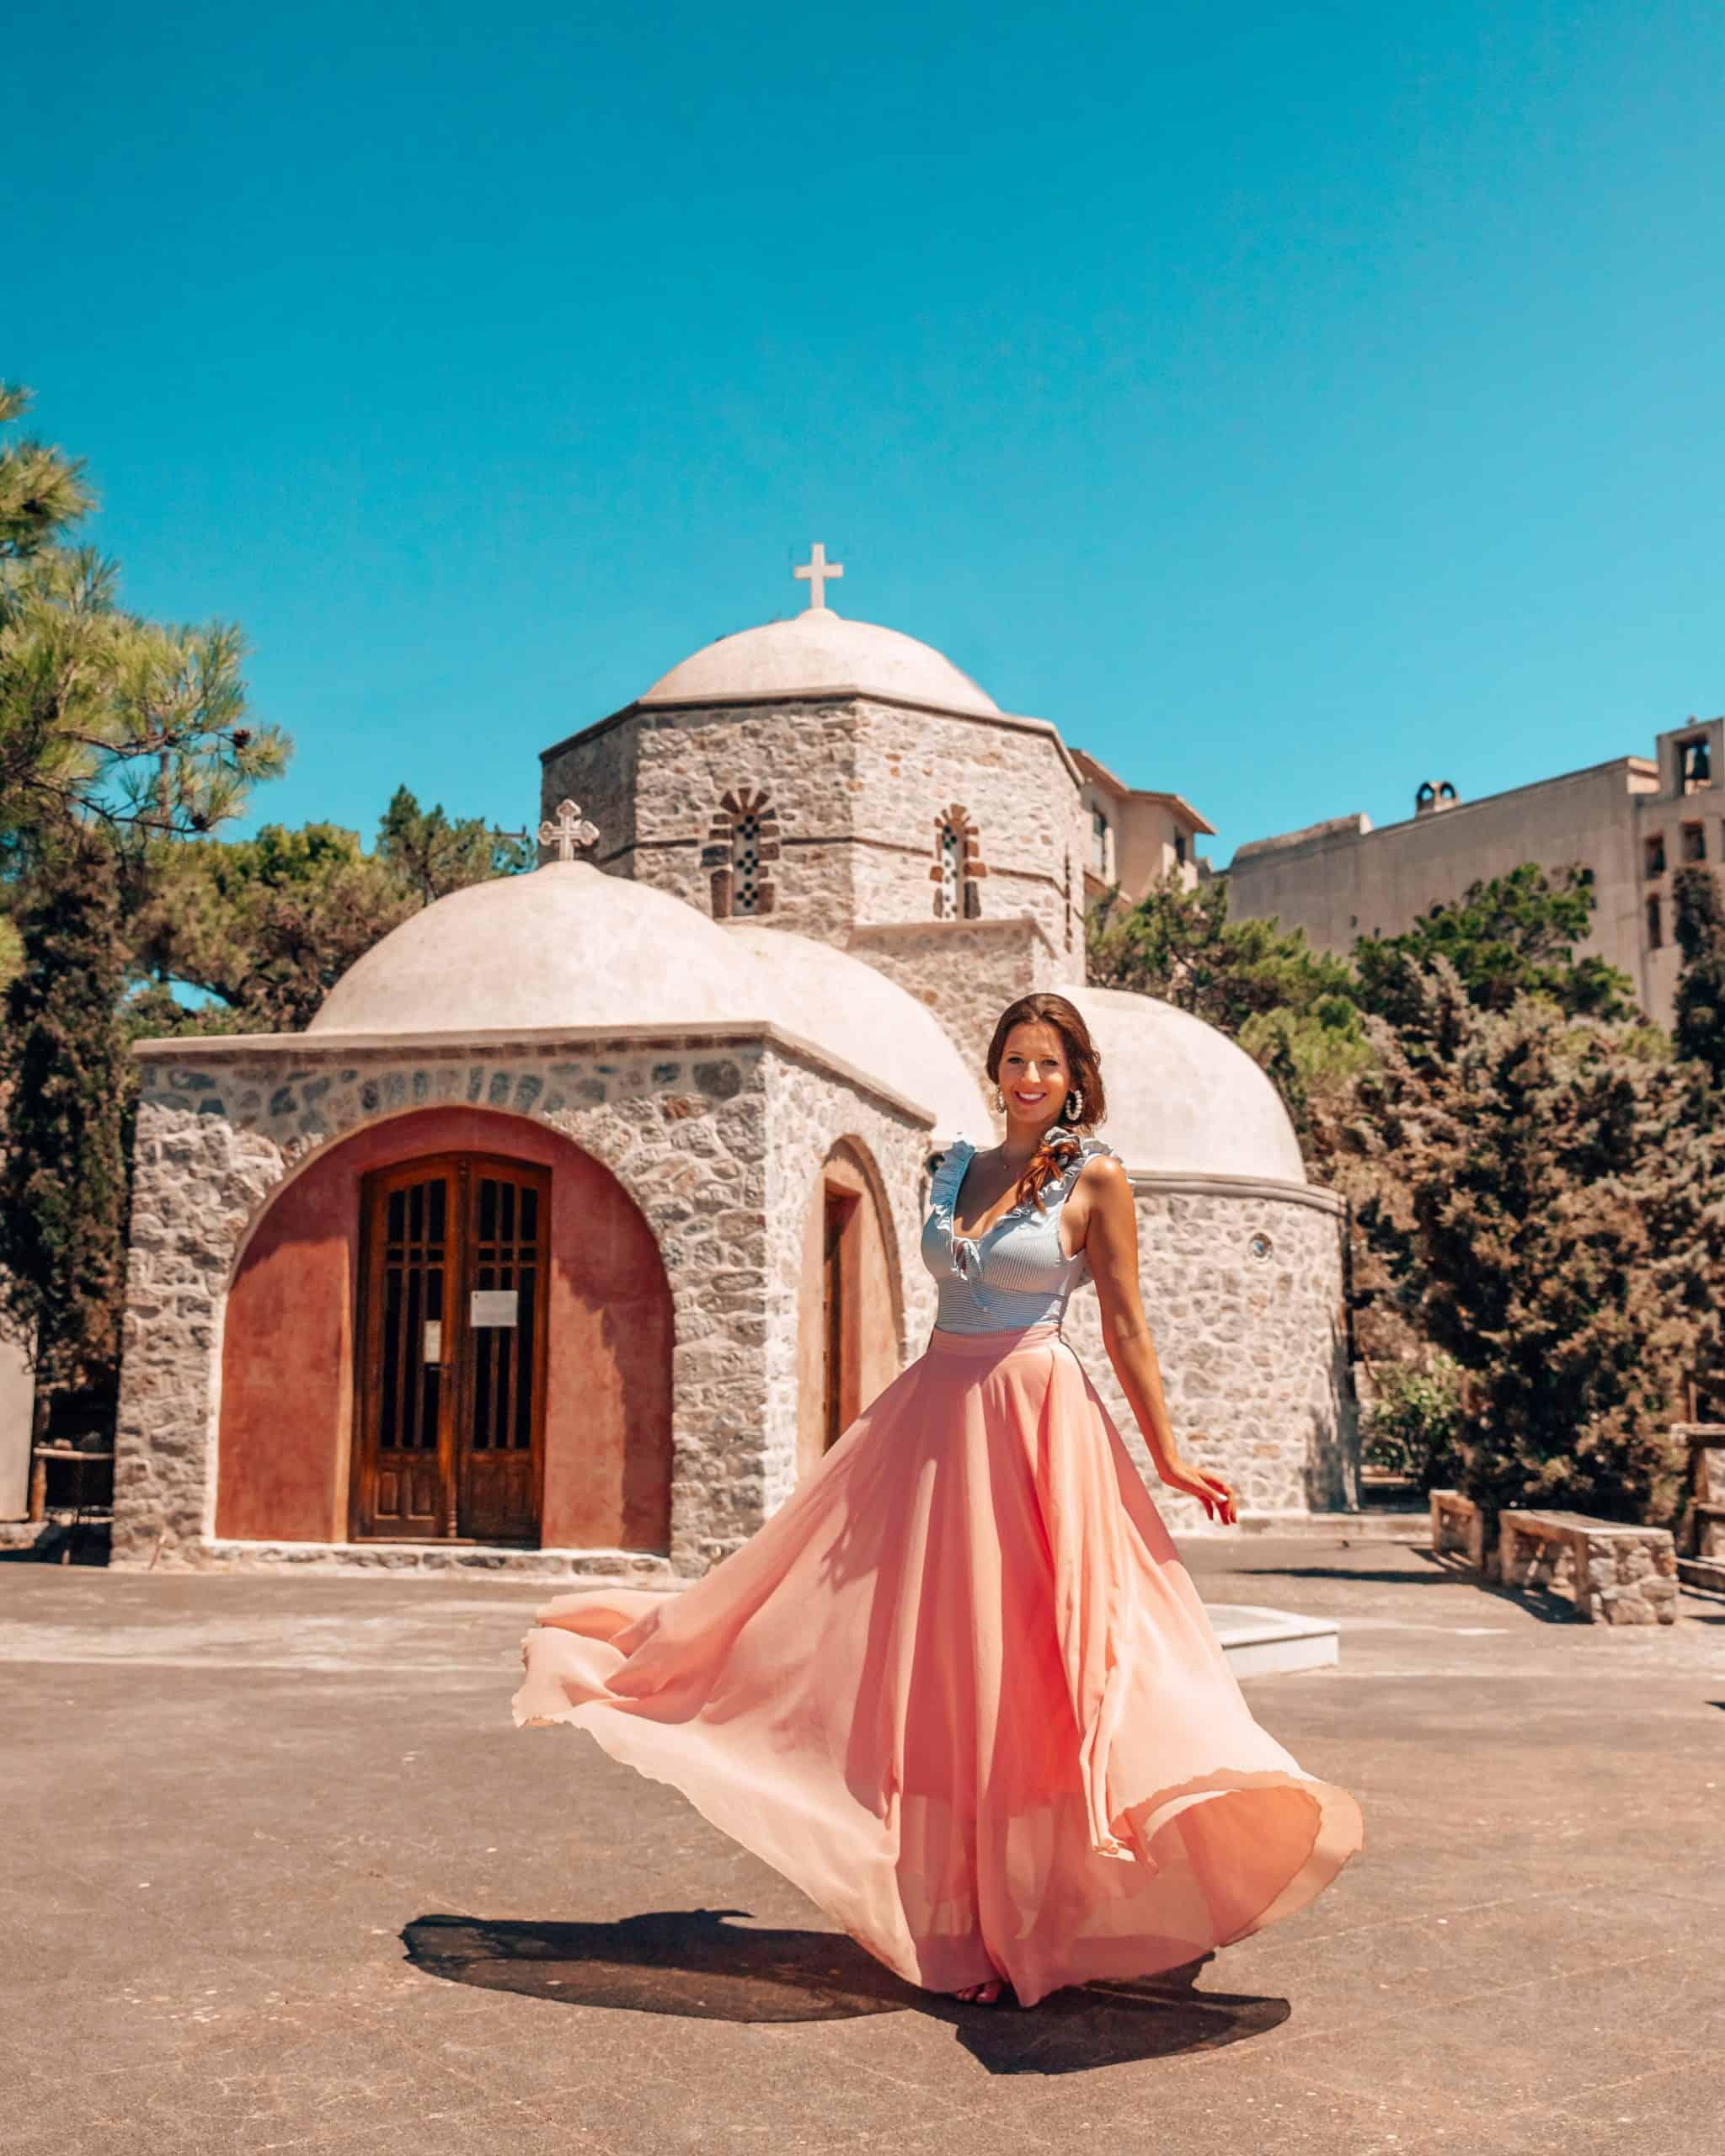 Bettina at Santorini Monastery of Profitis Ilias